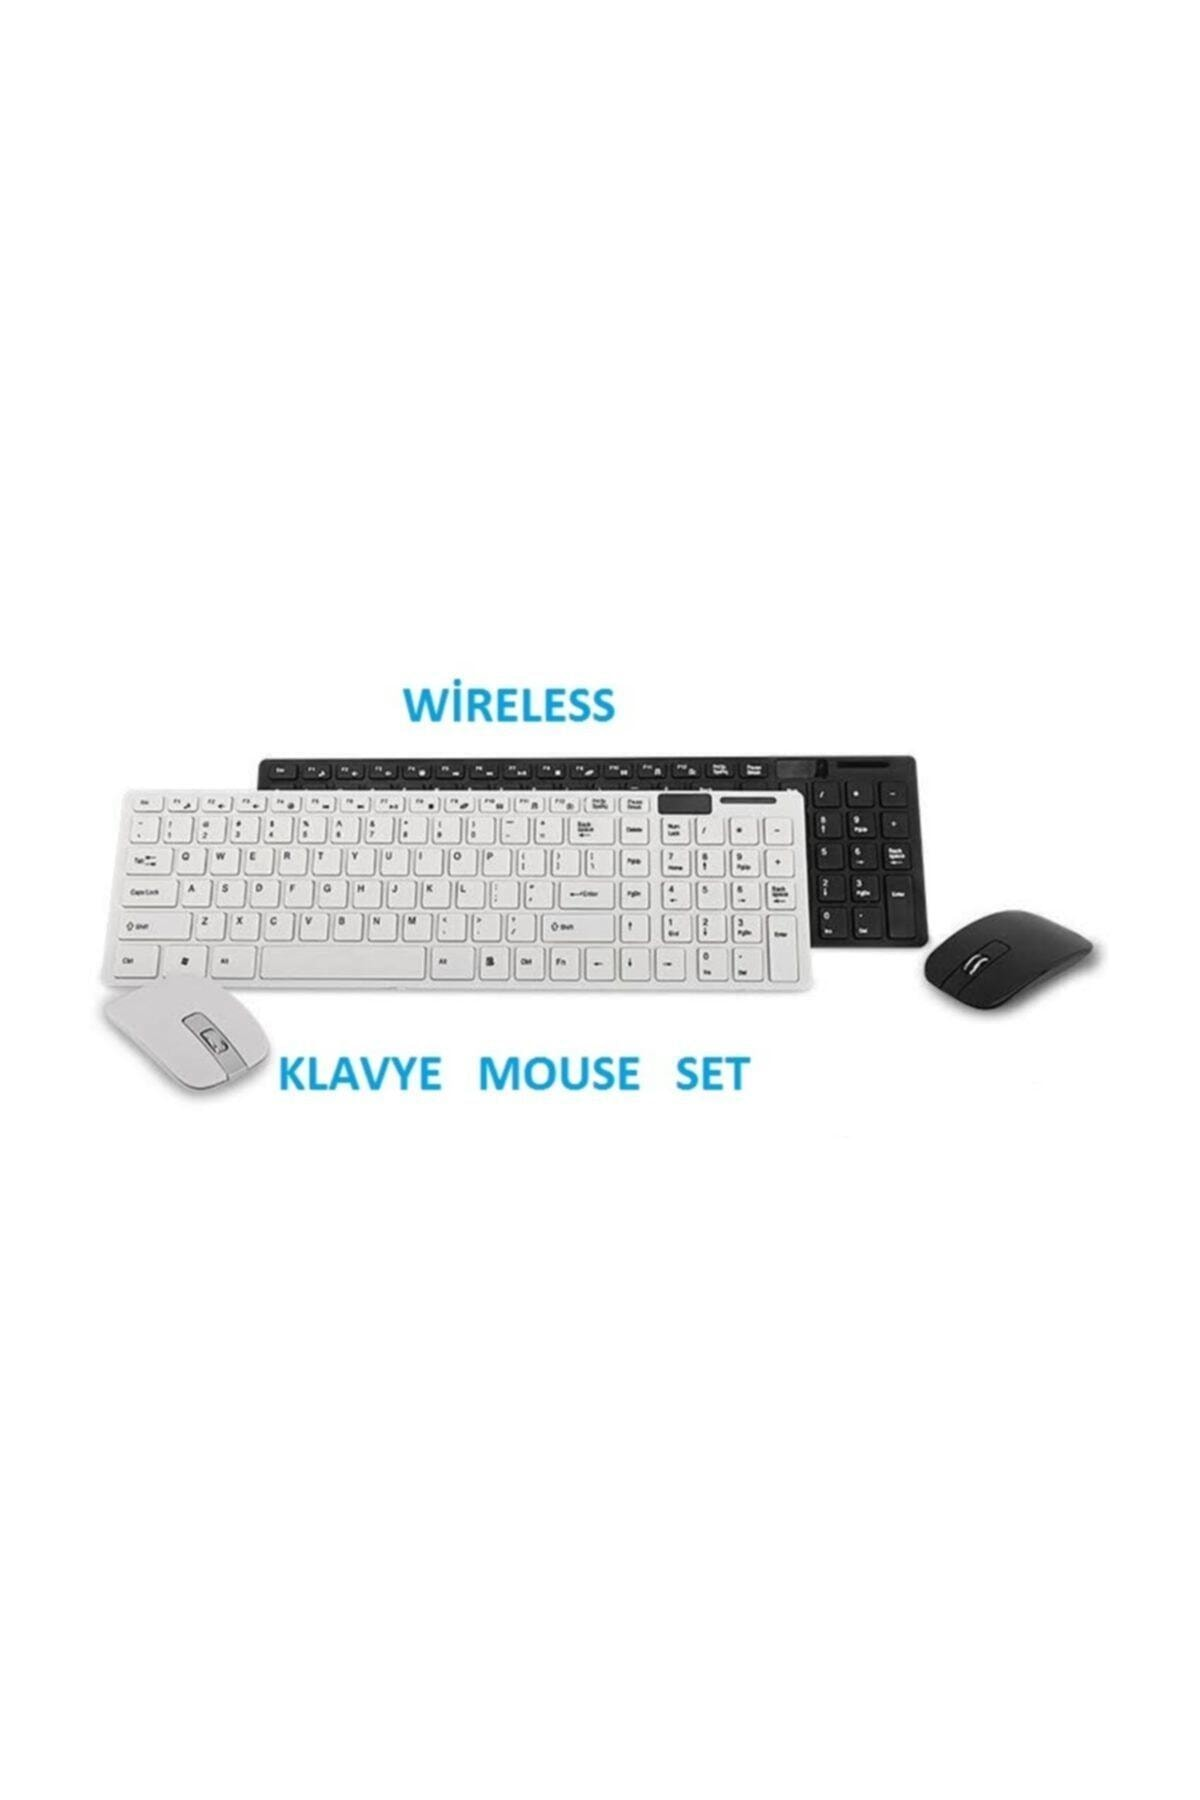 Platoon Kablosuz Klavye Mouse Seti 2.4 Ghz Wireless Tv Pc Uyumlu Pl-374 1